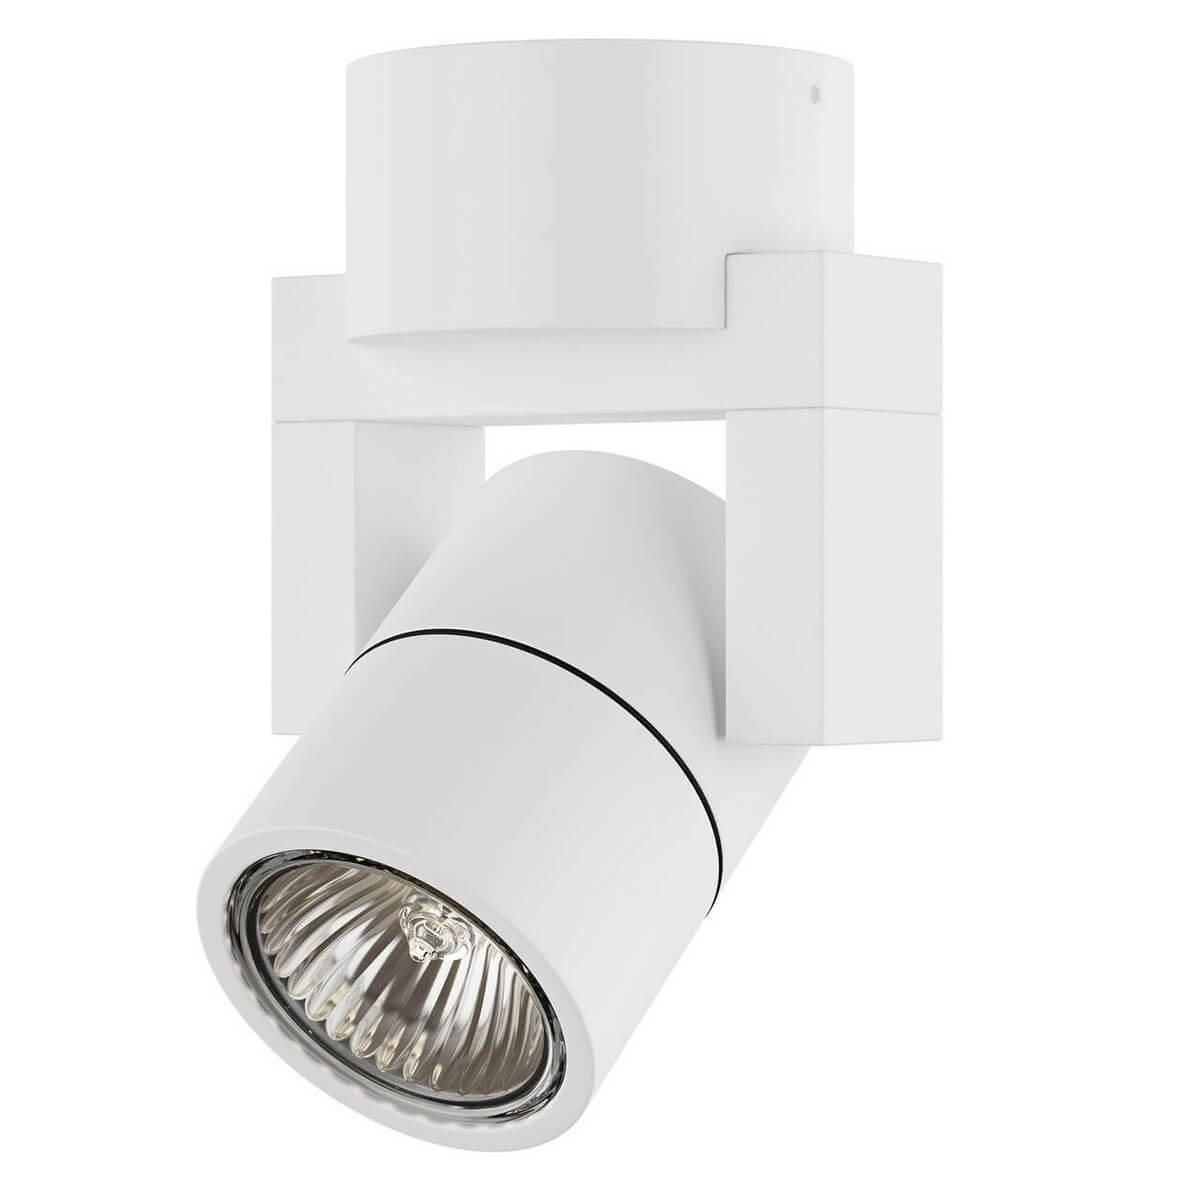 Накладной светильник Lightstar 051046, GU10, 50 Вт светильник donolux sa1541 sa1543 alu